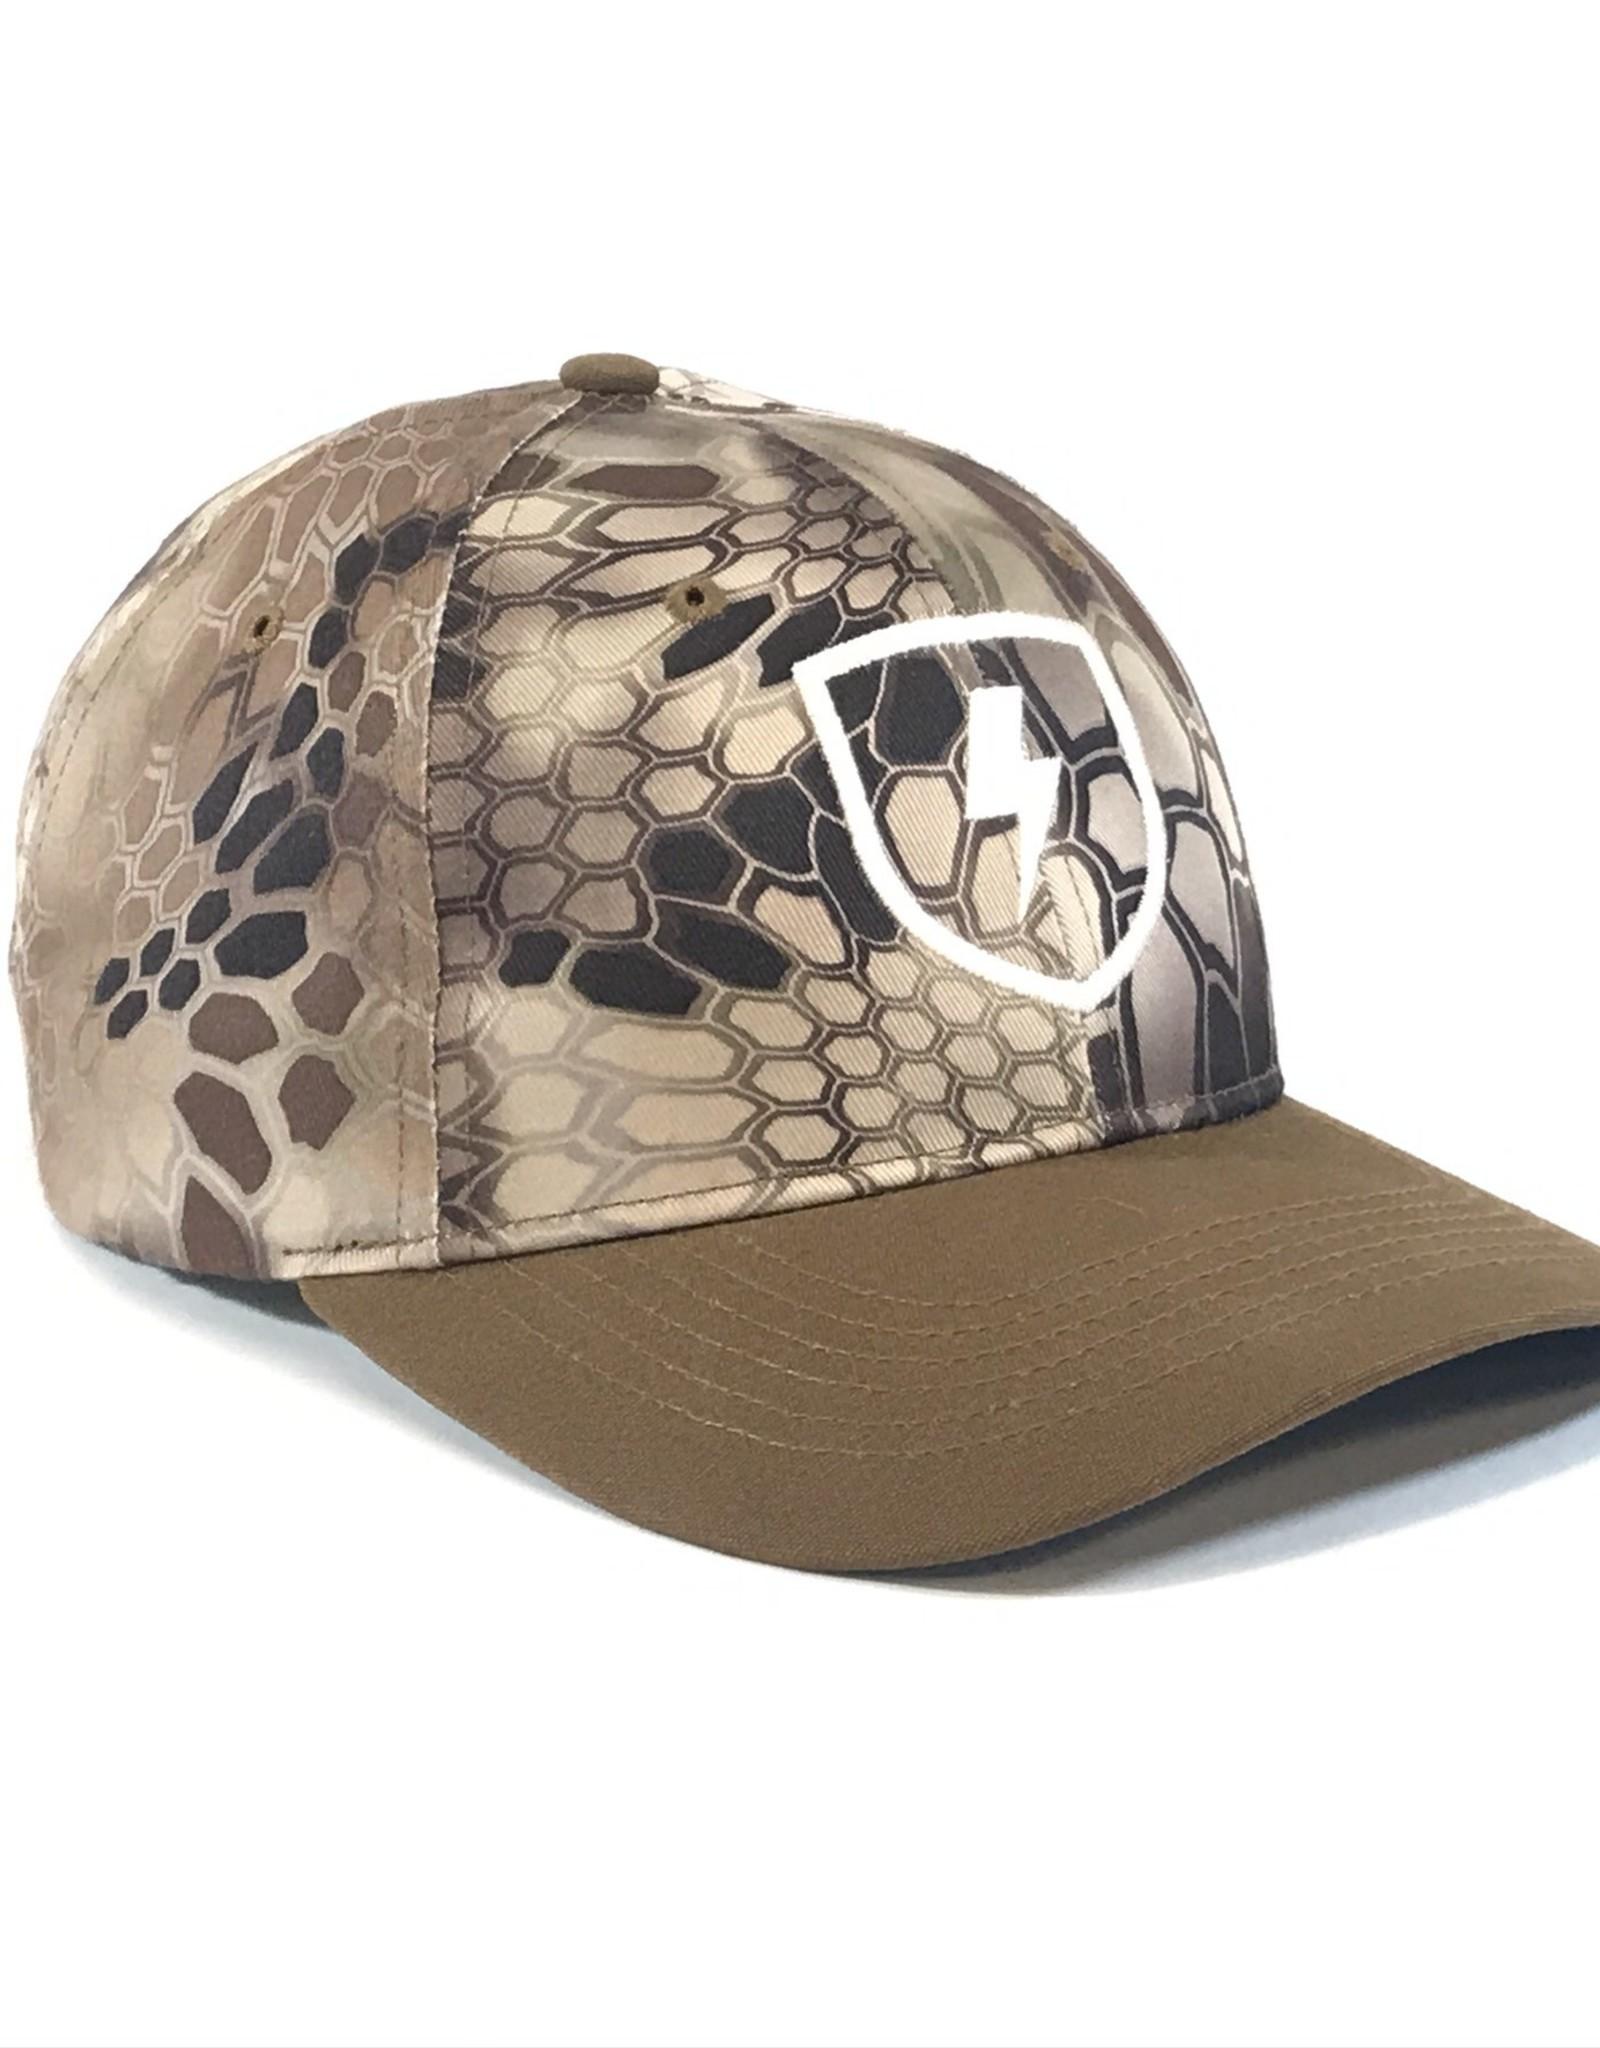 Defender Outdoors Camo Duck Cloth Hat